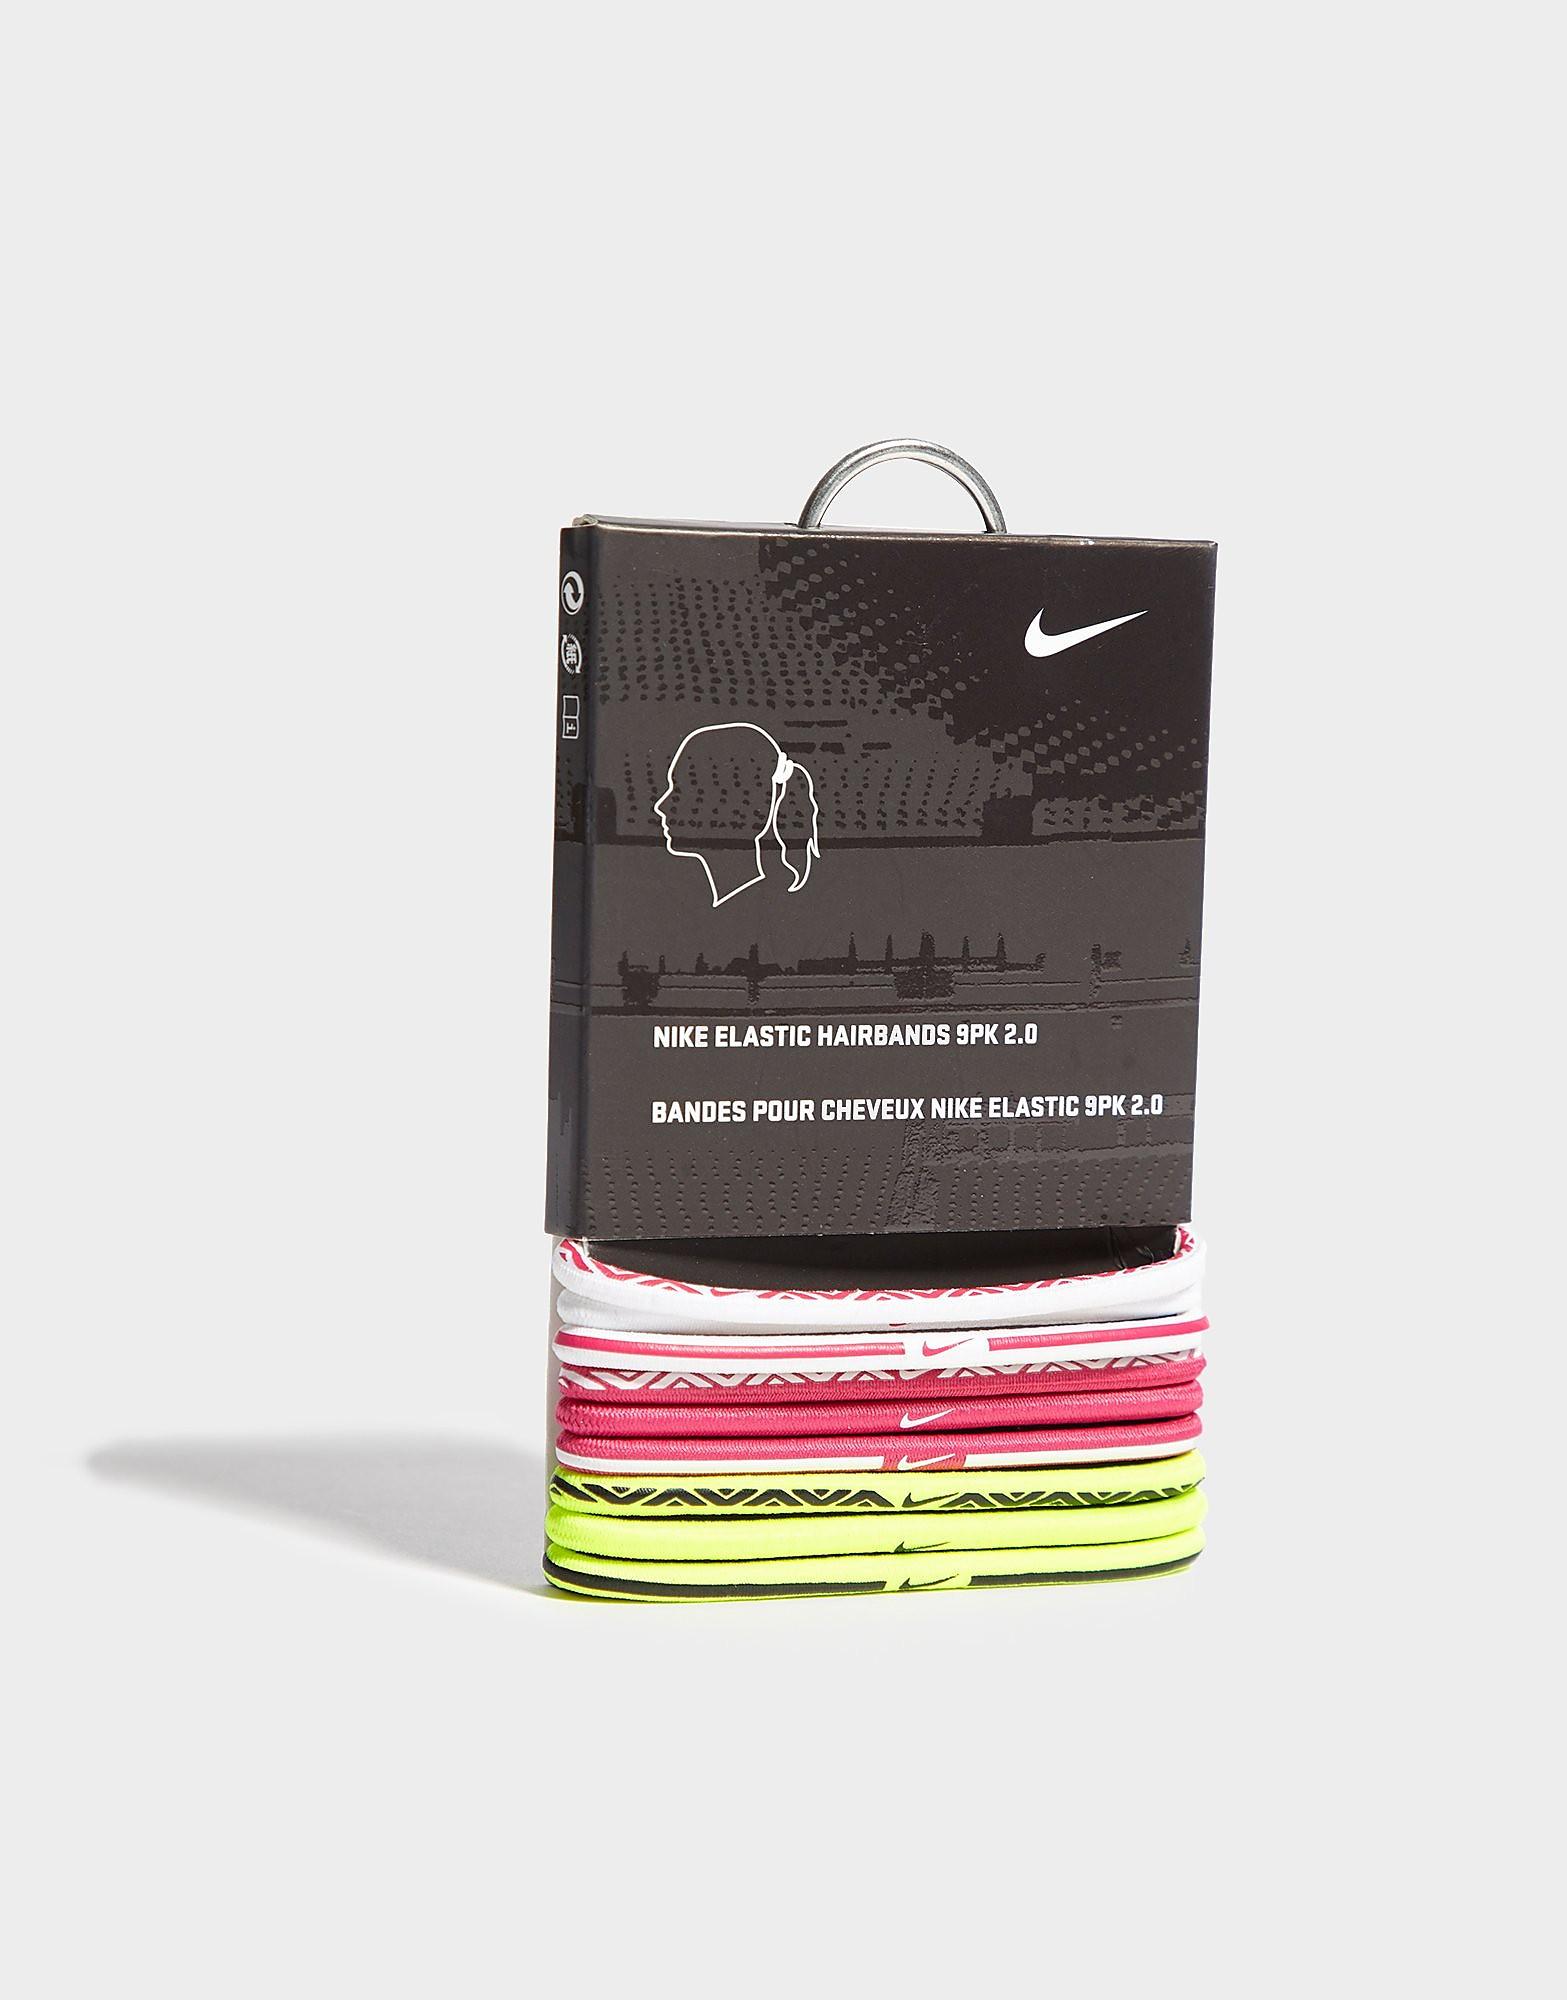 Nike 9 Pack Elastic Hairbands - Roze - Dames